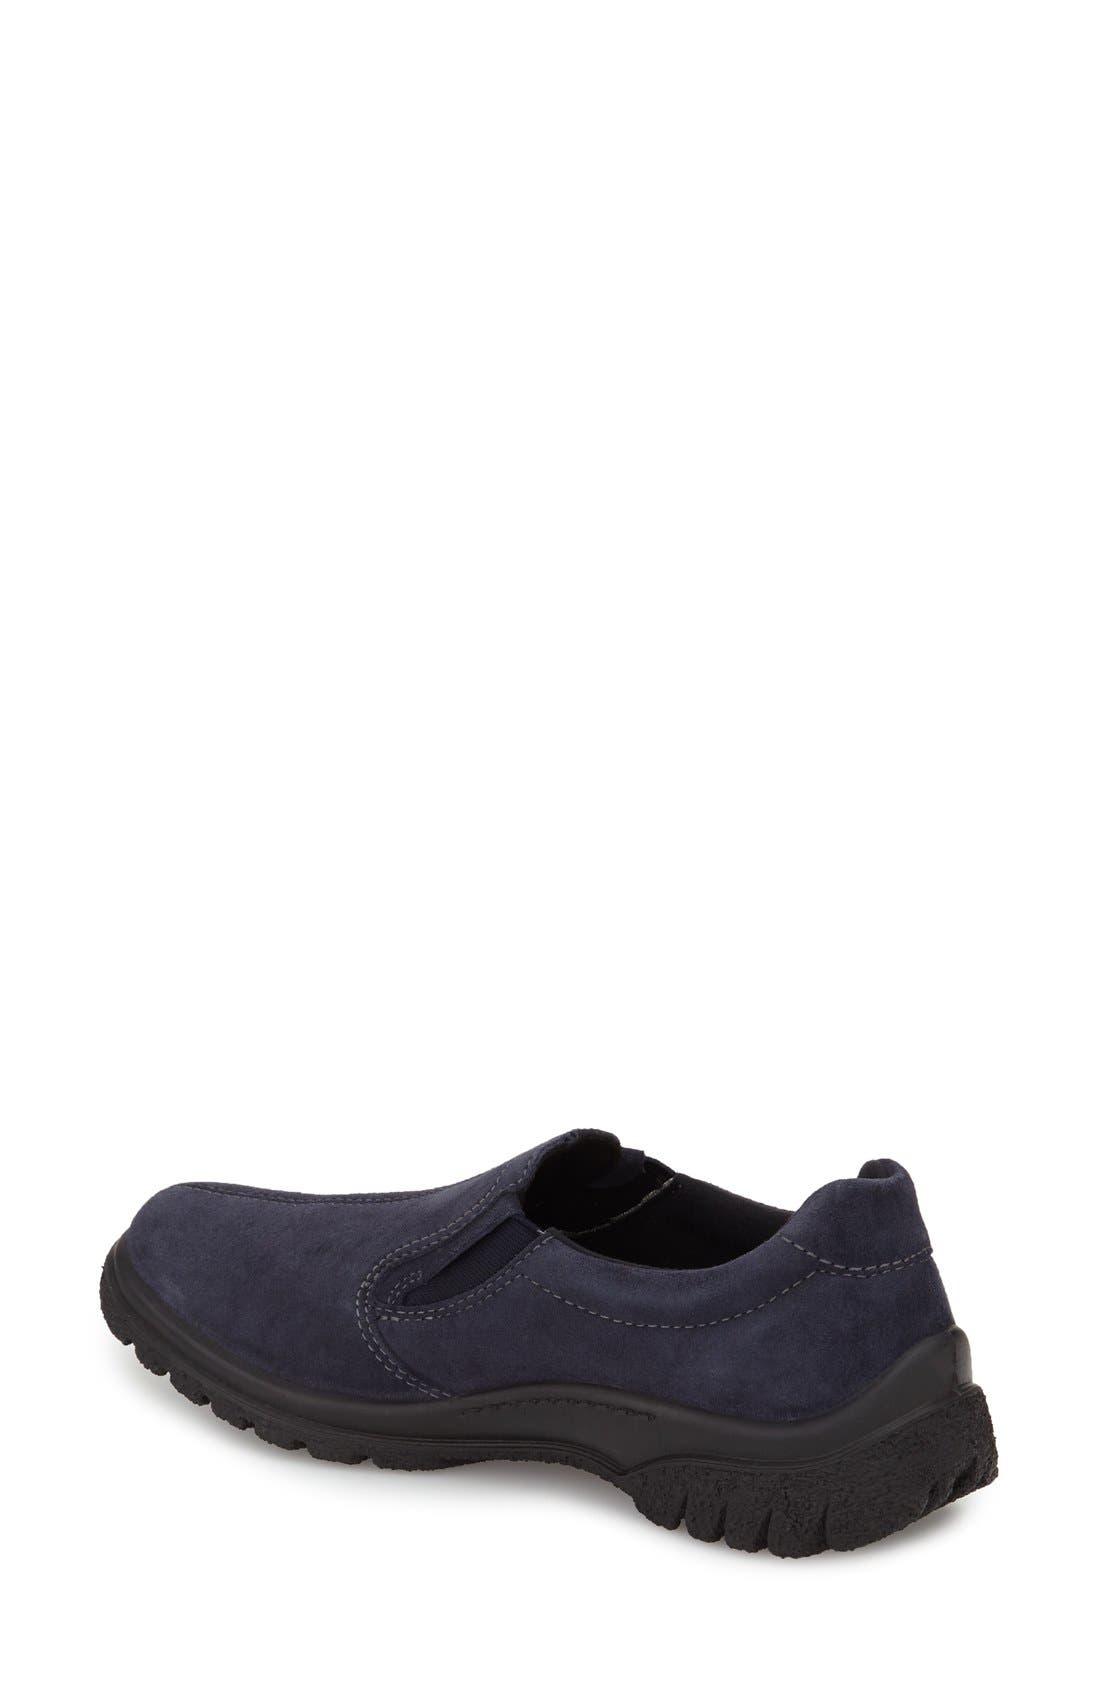 Parson Waterproof Gore-Tex<sup>®</sup> Slip-On Sneaker,                             Alternate thumbnail 2, color,                             NAVY SUEDE